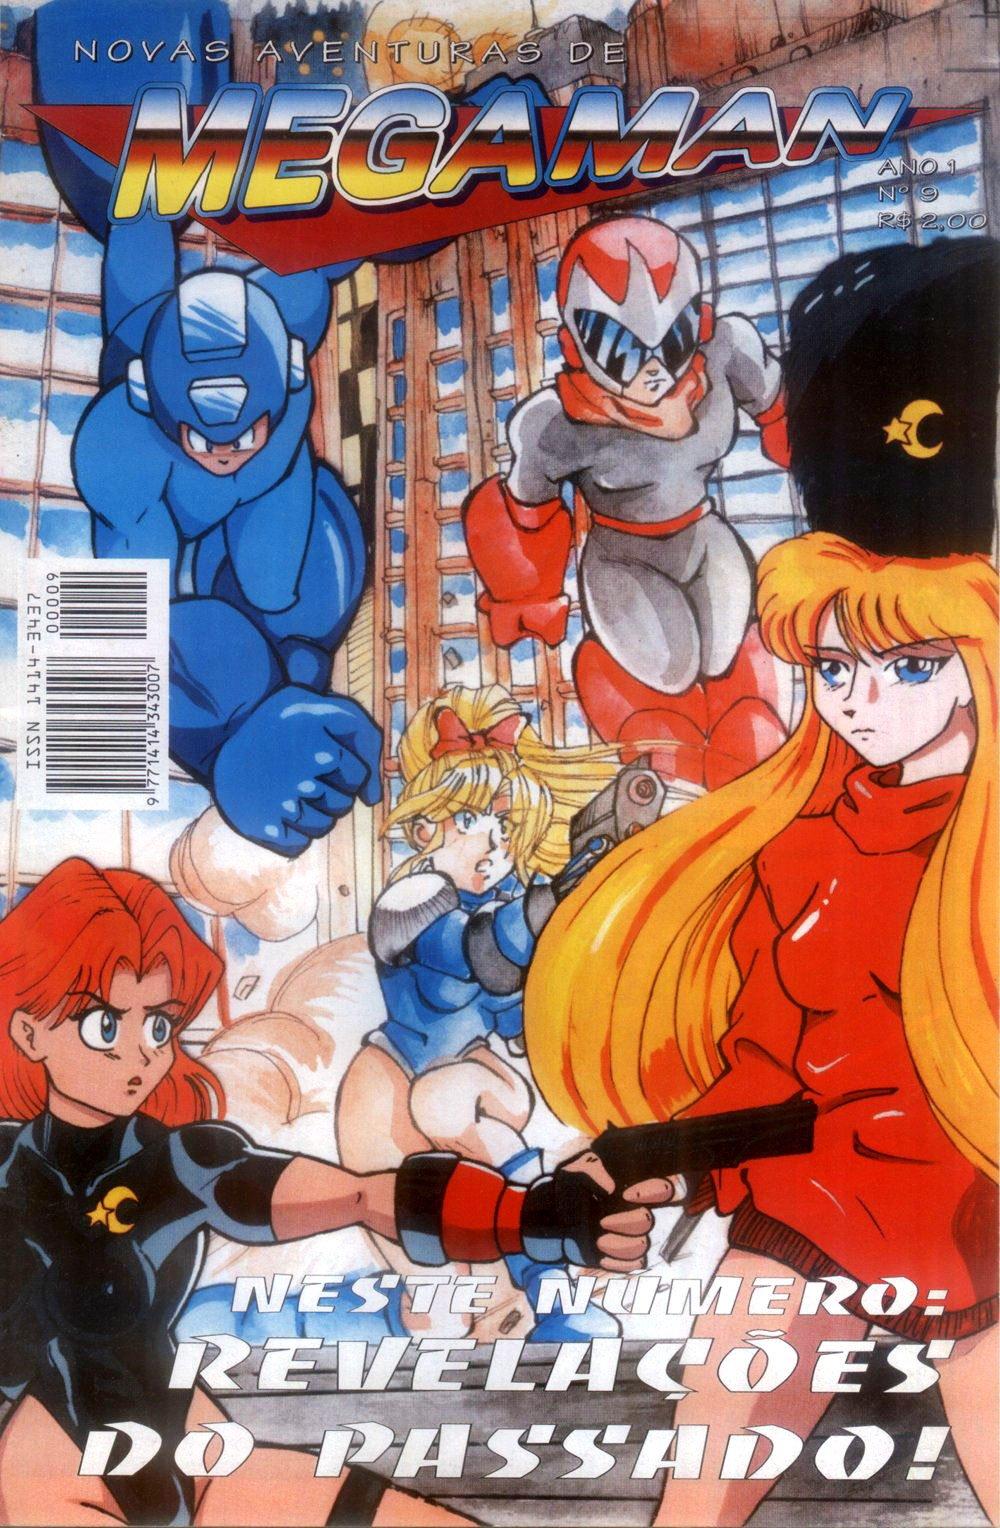 New Adventures of Mega Man Issue 09 (1997)